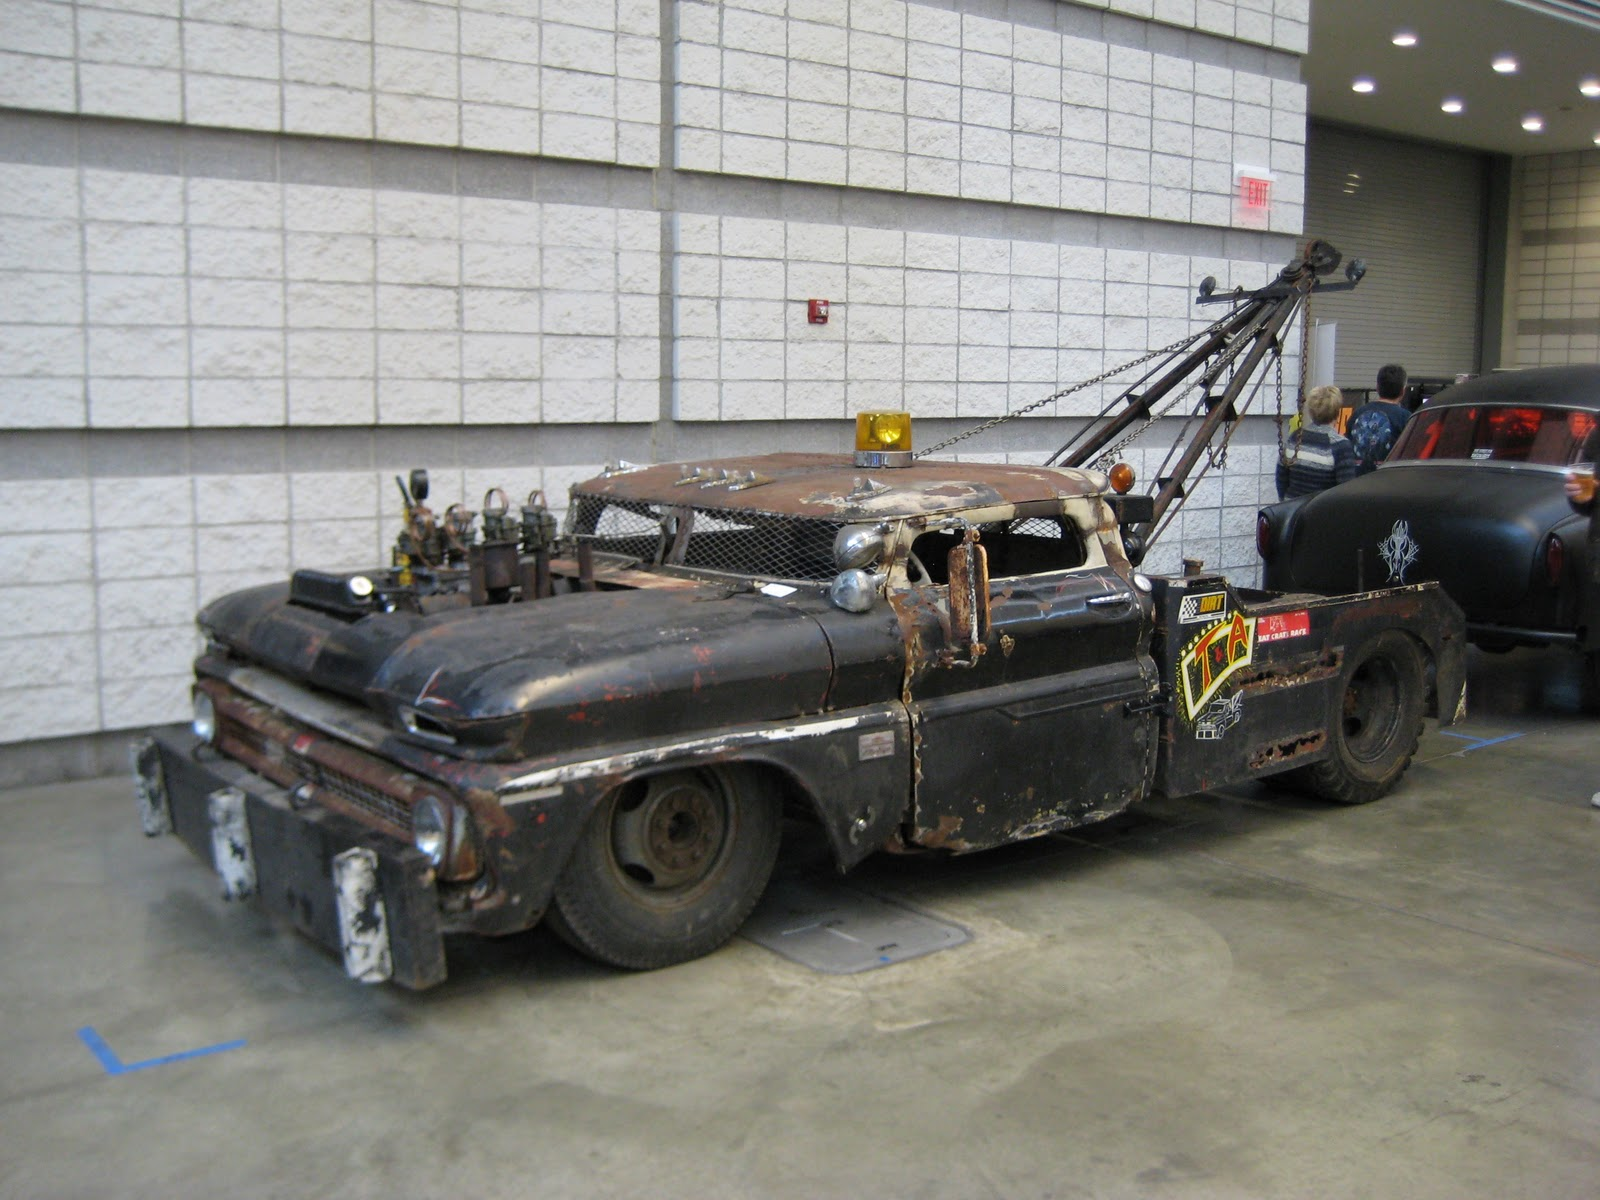 Tow Truck C-10 rat rod.